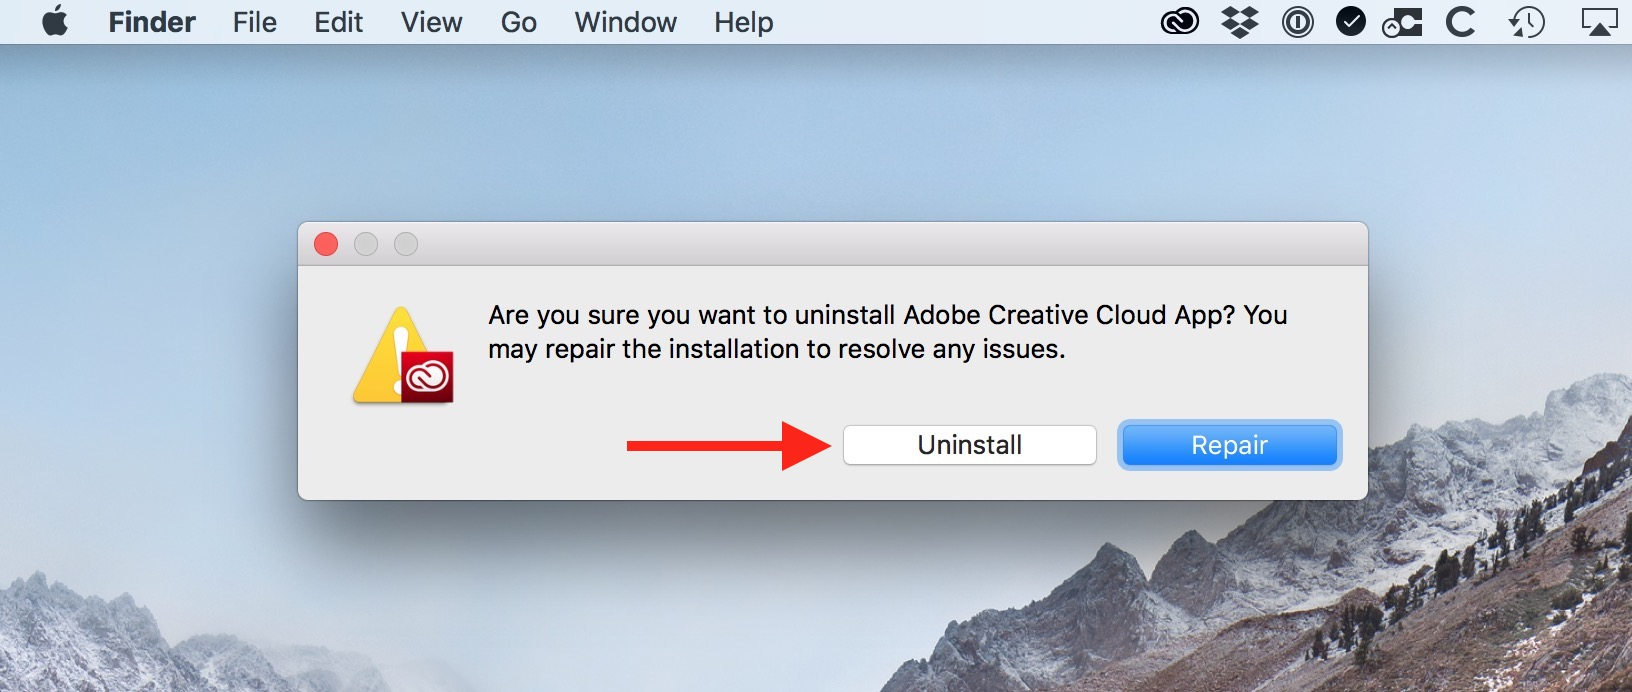 How to Uninstall Creative Cloud on the Mac